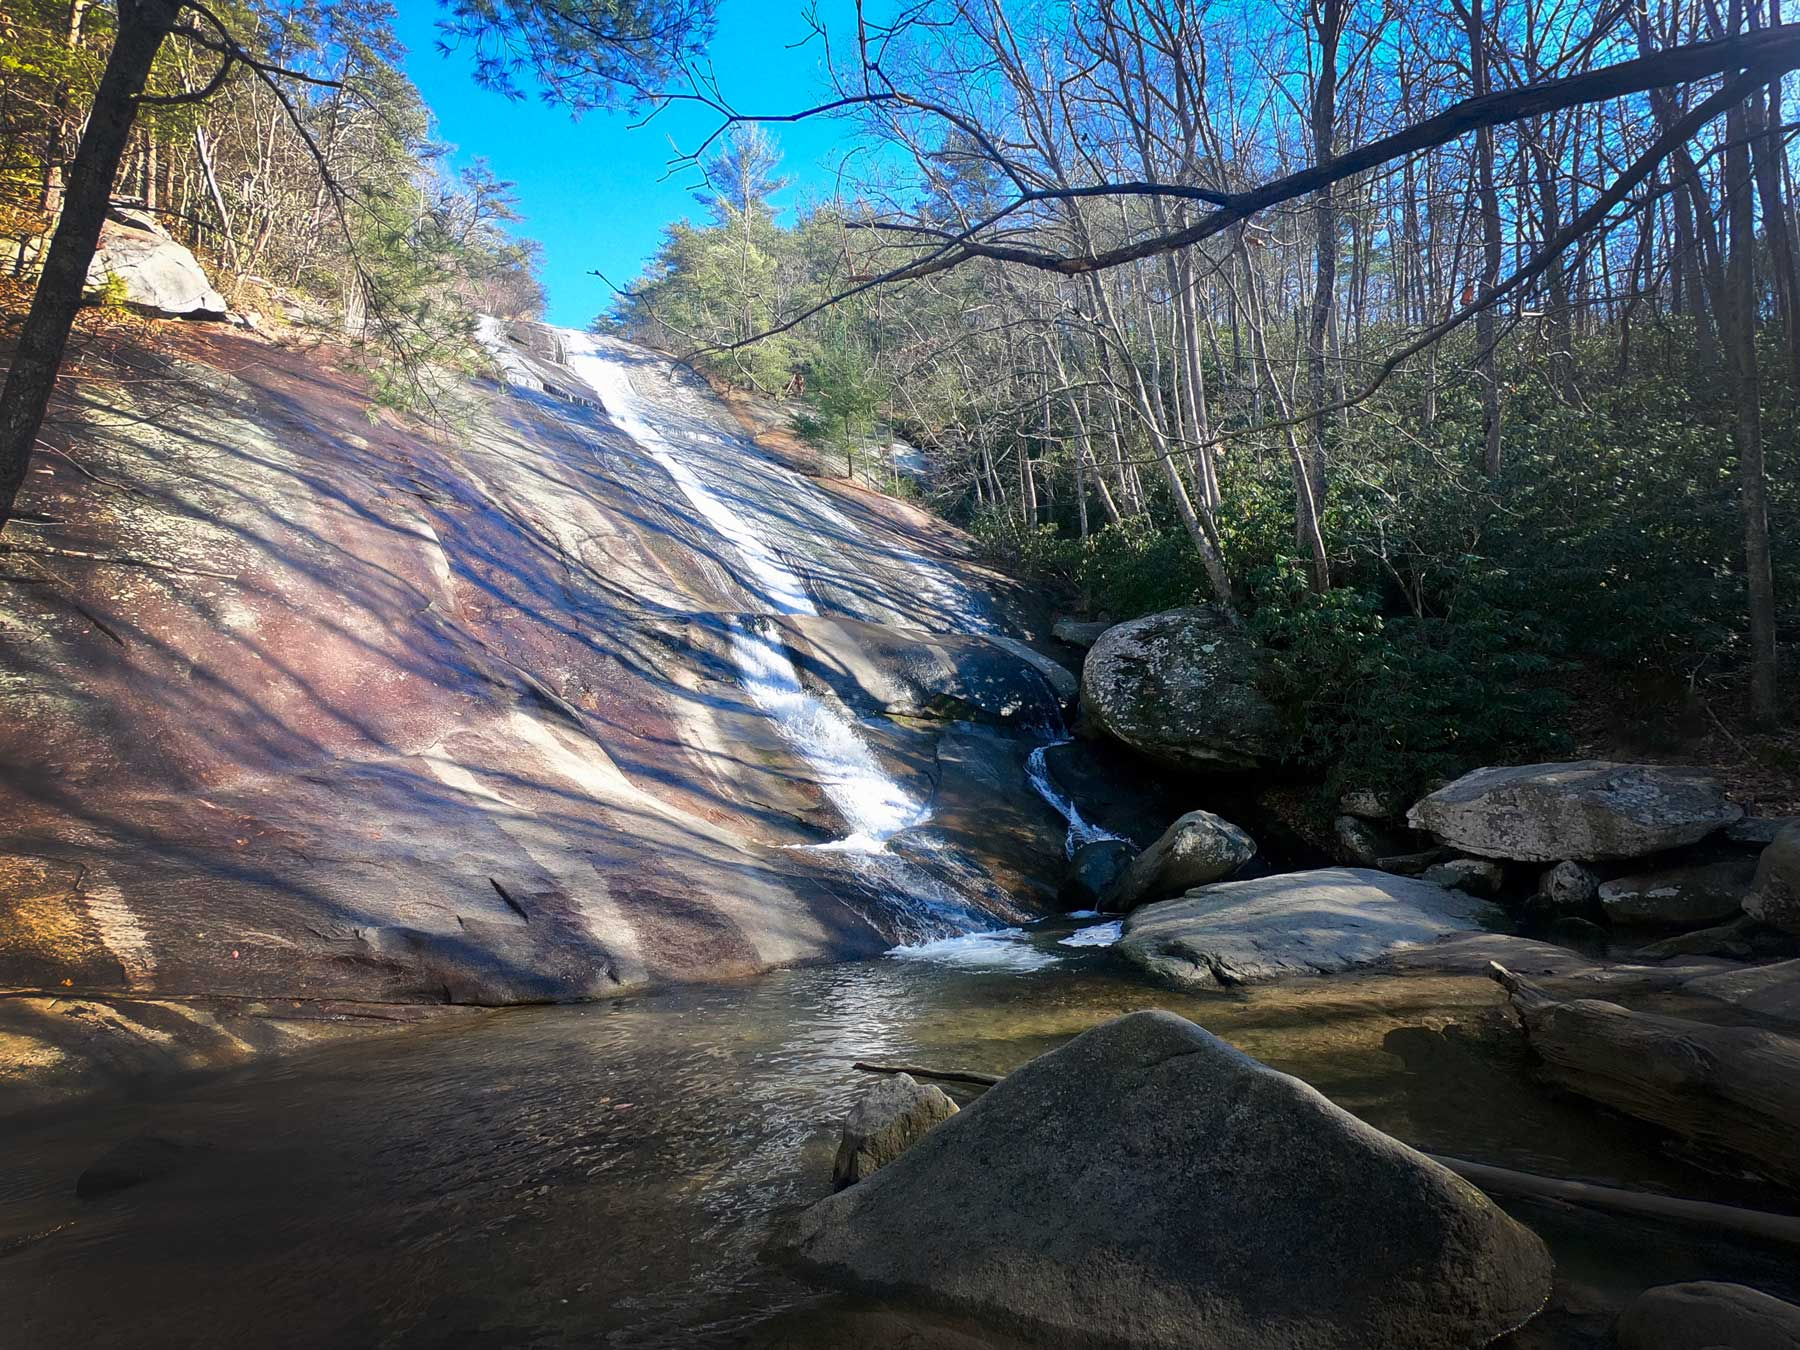 Stone Mountain 200 foot waterfall at Stone Mountain State Park, North Carolina